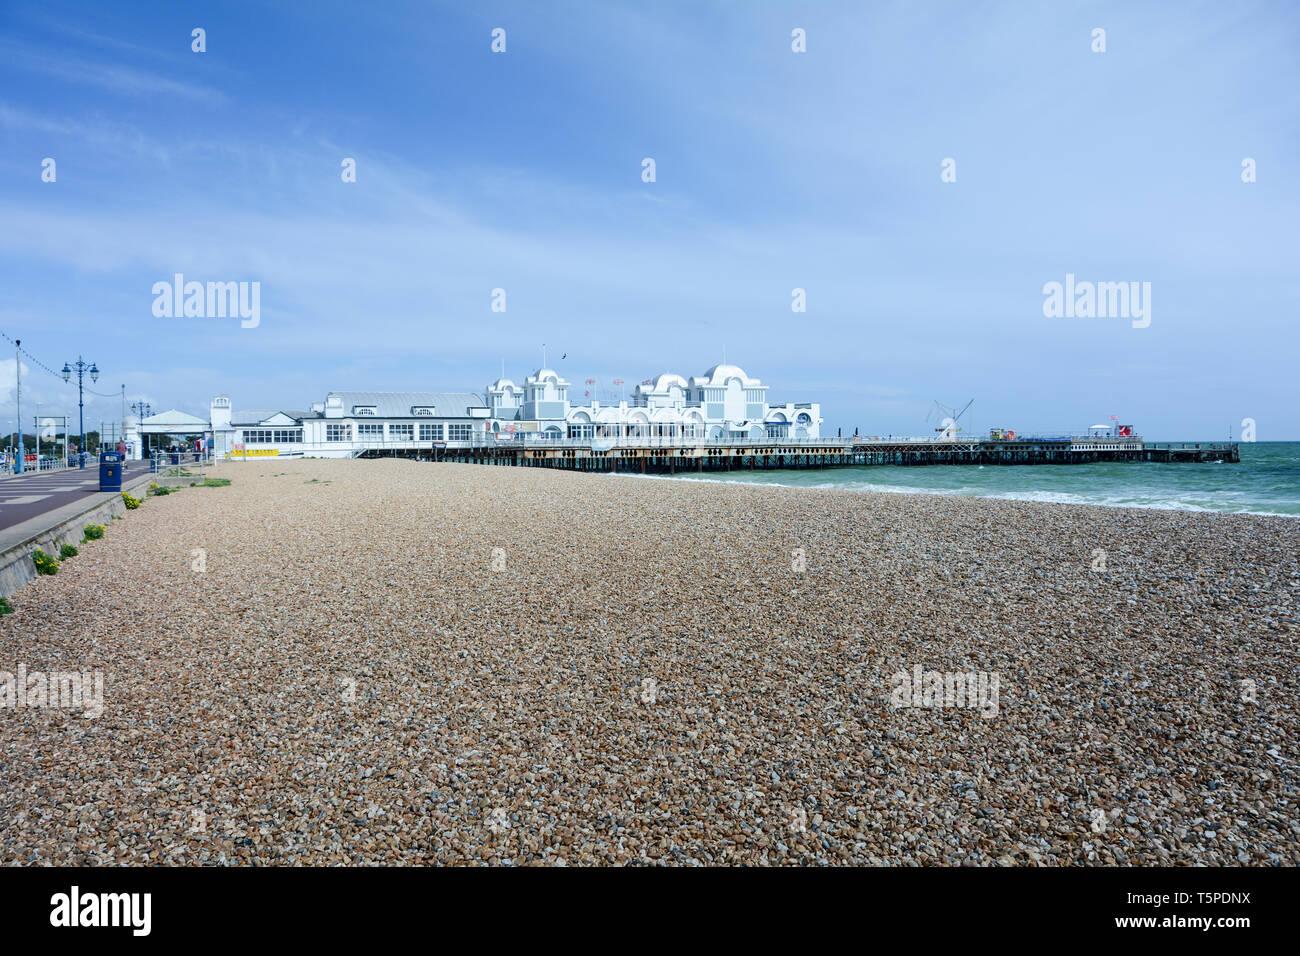 South Parade Pier, Southsea, Hampshire, England, UK Stock Photo